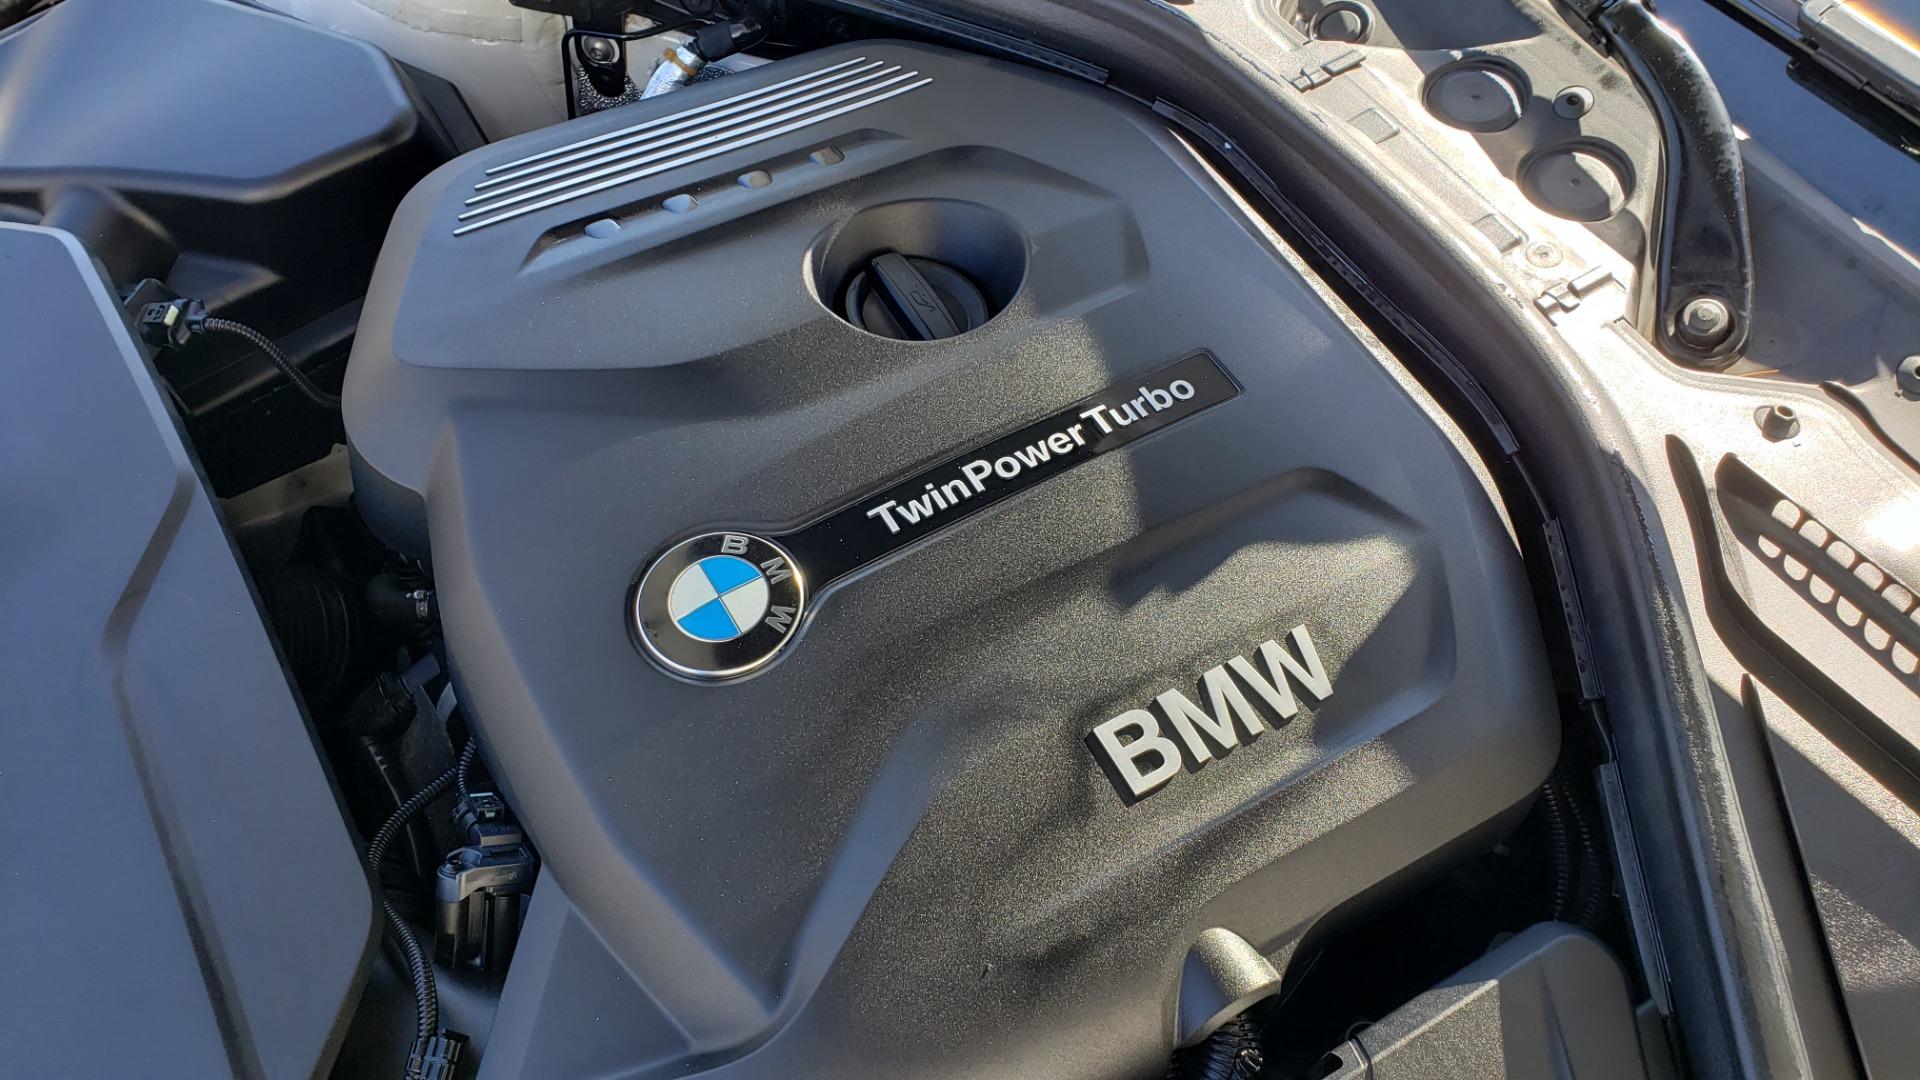 Used 2018 BMW 4 SERIES 430IXDRIVE / PREMIUM / NAV / SUNROOF / ESSENTIALS PKG for sale $27,795 at Formula Imports in Charlotte NC 28227 14